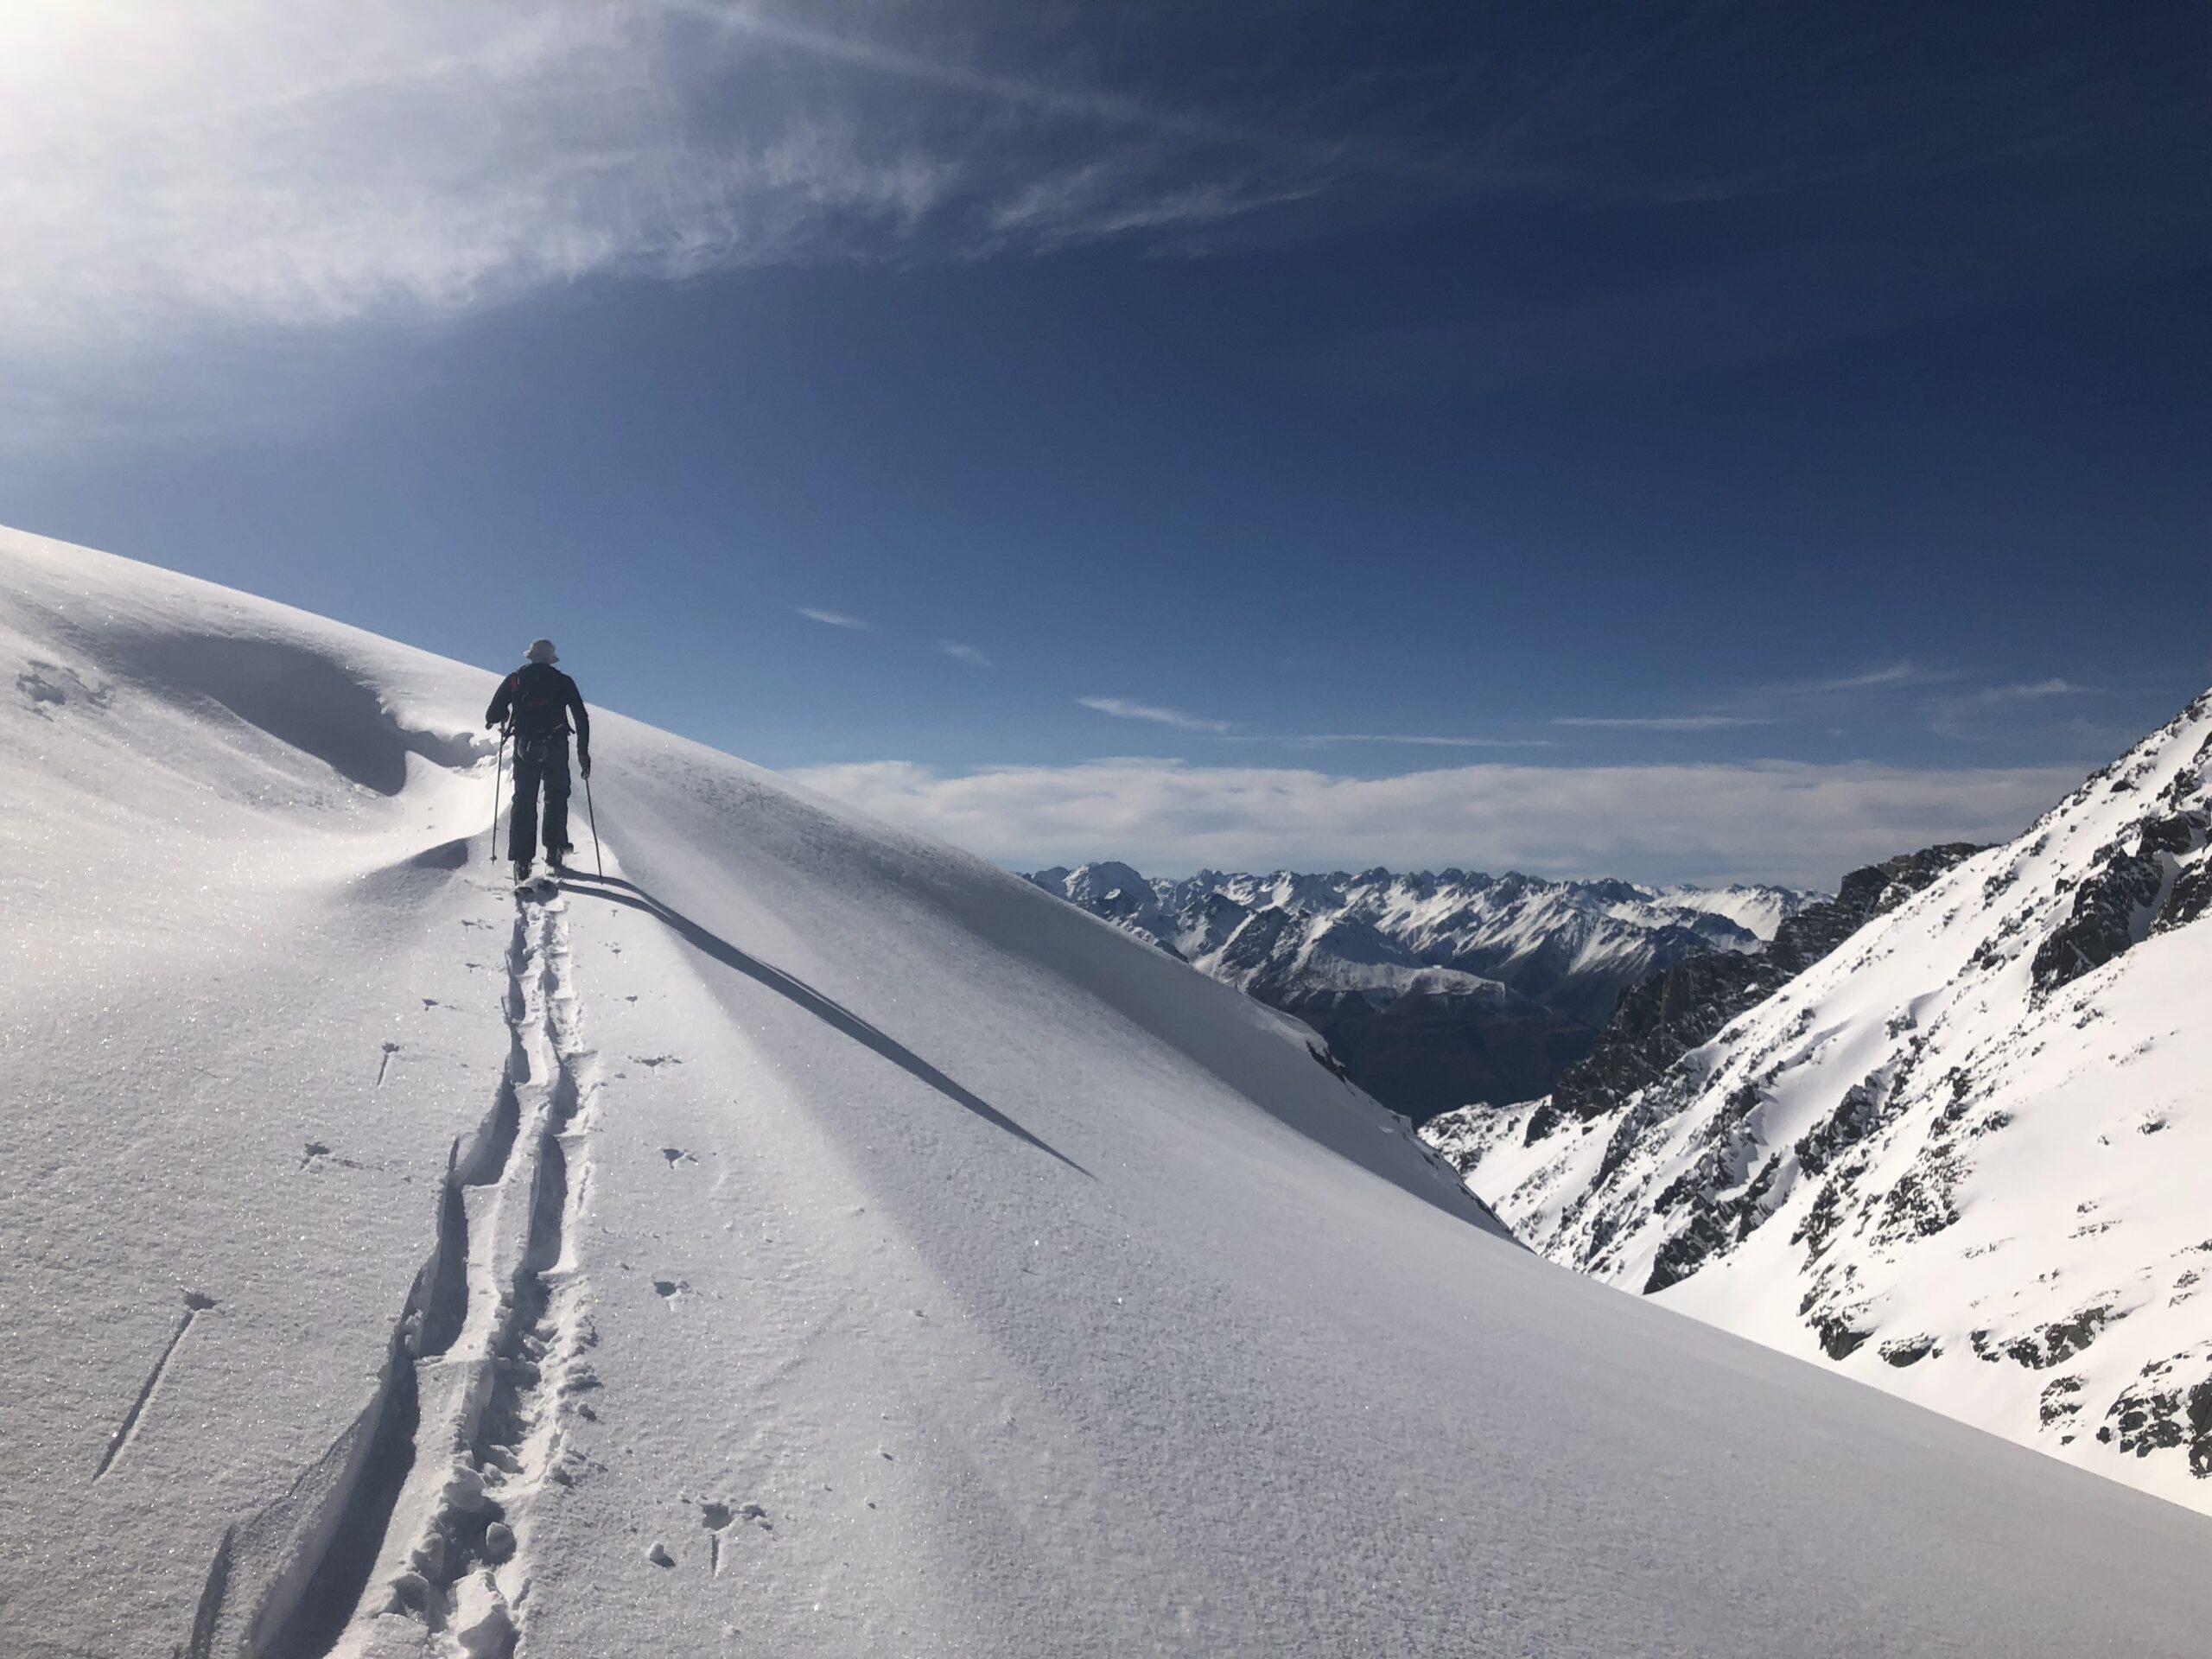 Ski Touring in New Zealand